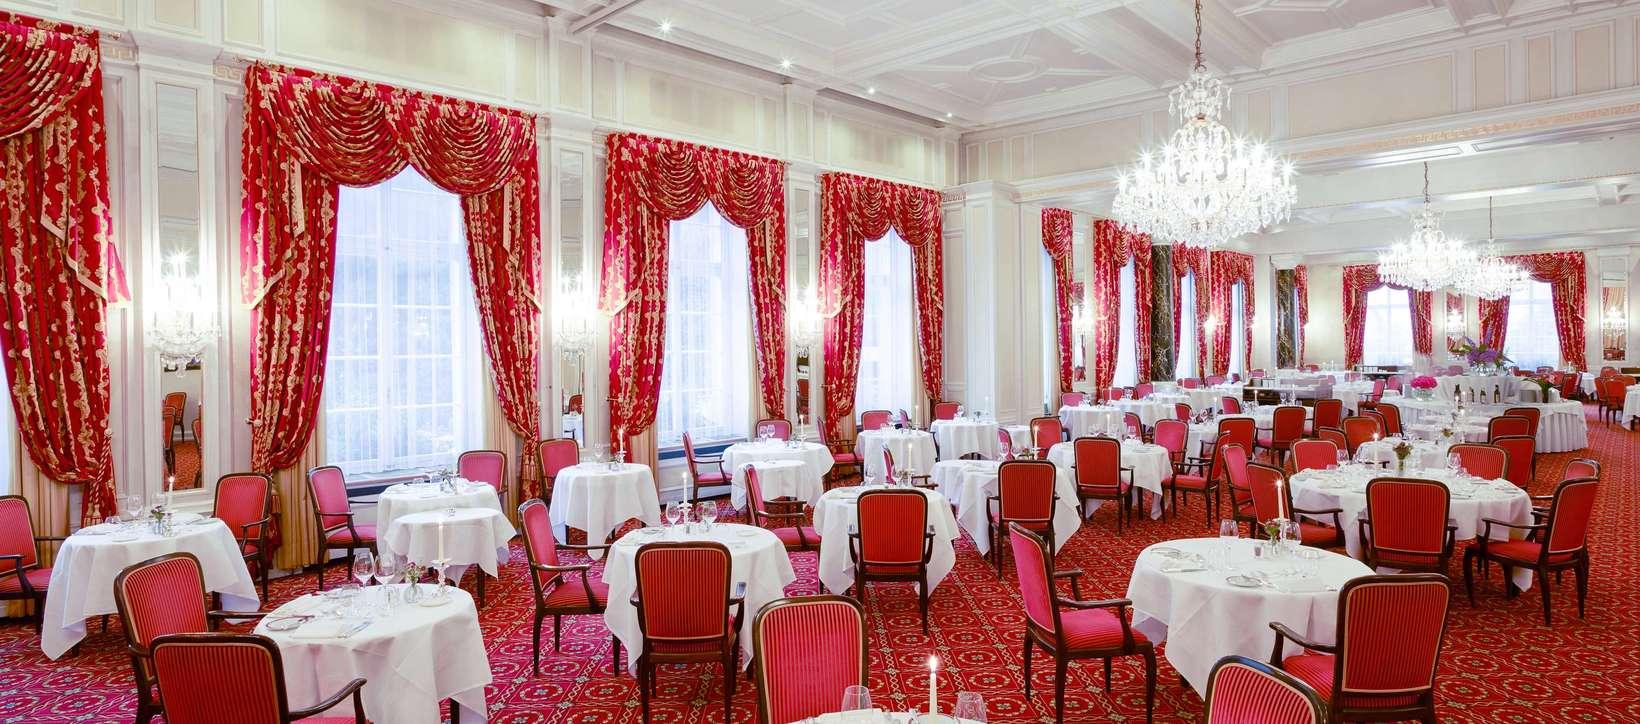 Kulm Hotel - Grand Restaurant